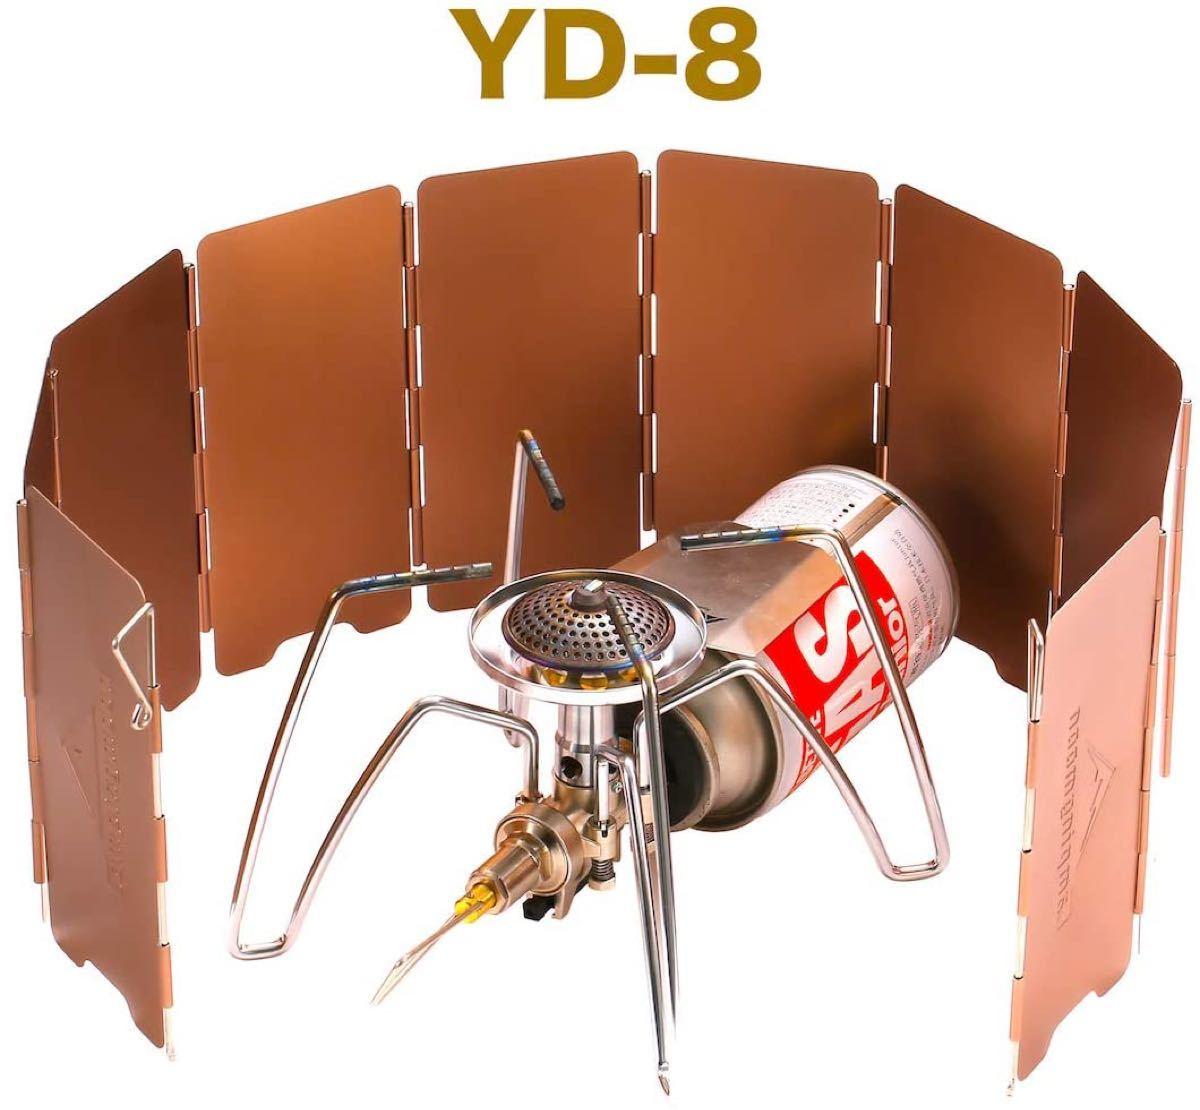 ★CAMPING MOON★キャンピングムーン★ウィンドスクリーンM★折り畳み式 風防板★酸化アルミ被膜プレート★YD-8★